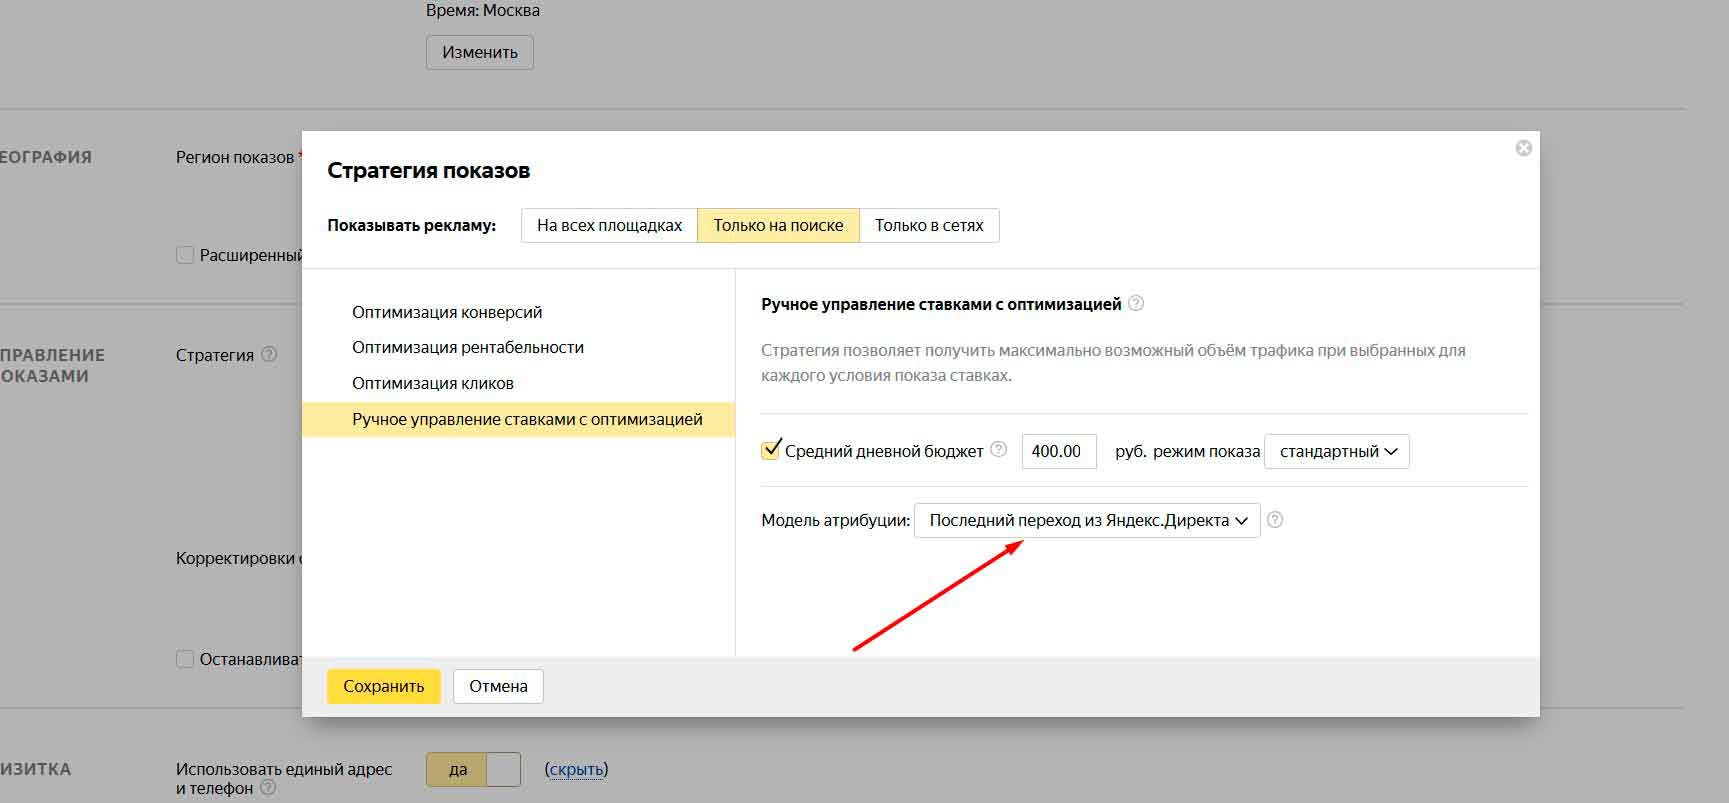 Модель атрибуции в Яндекс Метрике и Директе